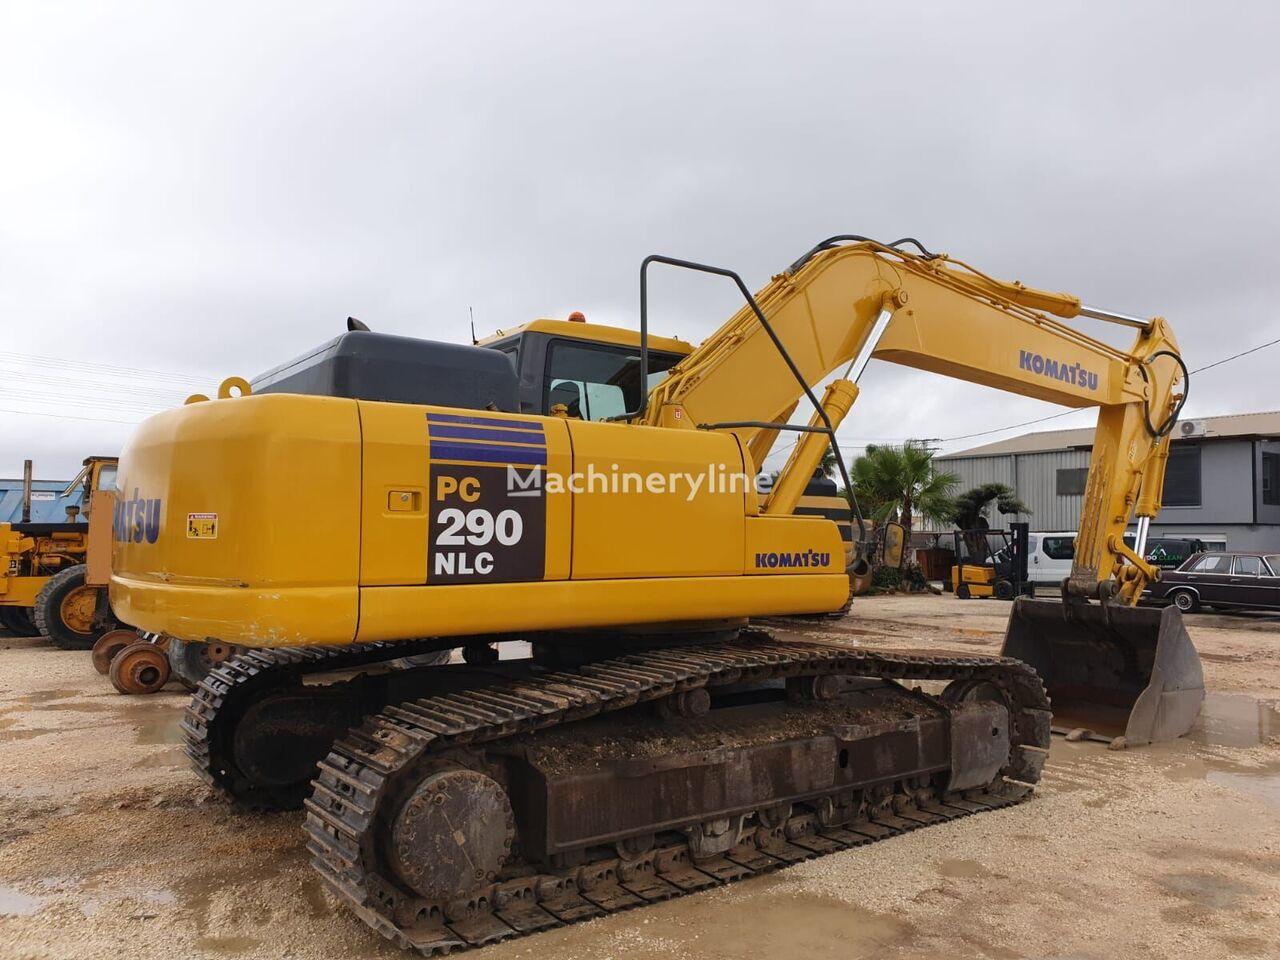 KOMATSU PC290NLC excavadora de orugas